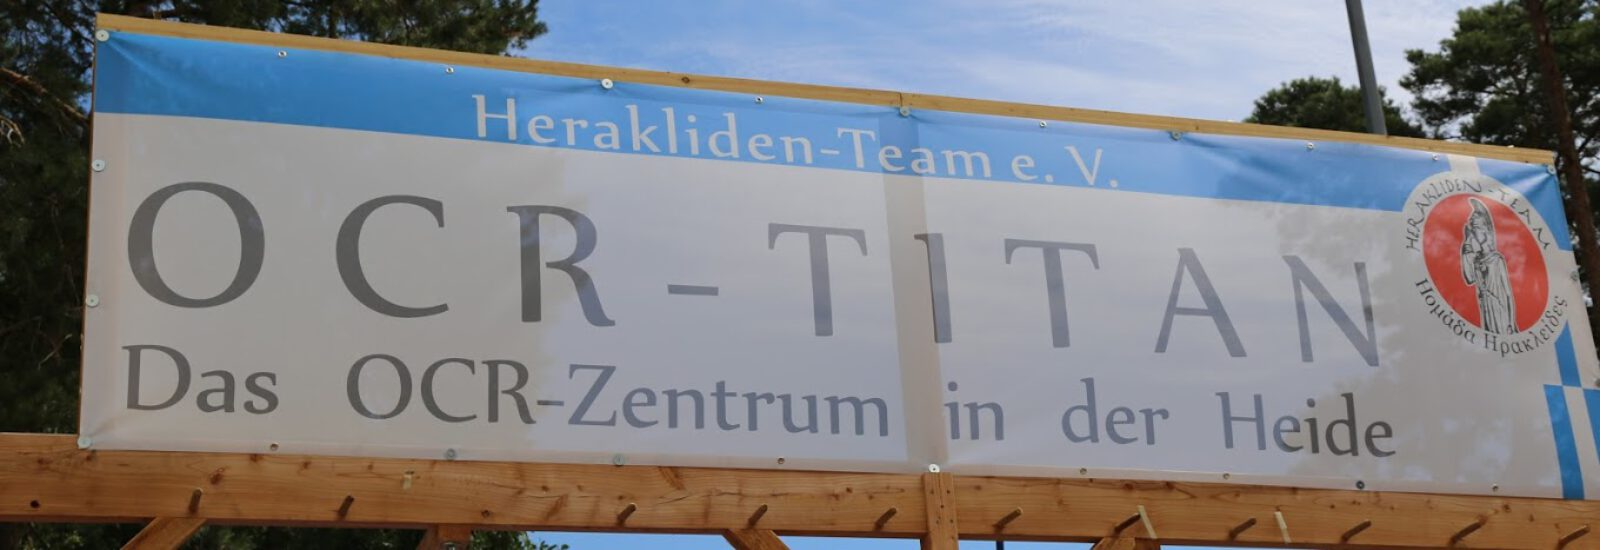 Herakliden-Team e.V.